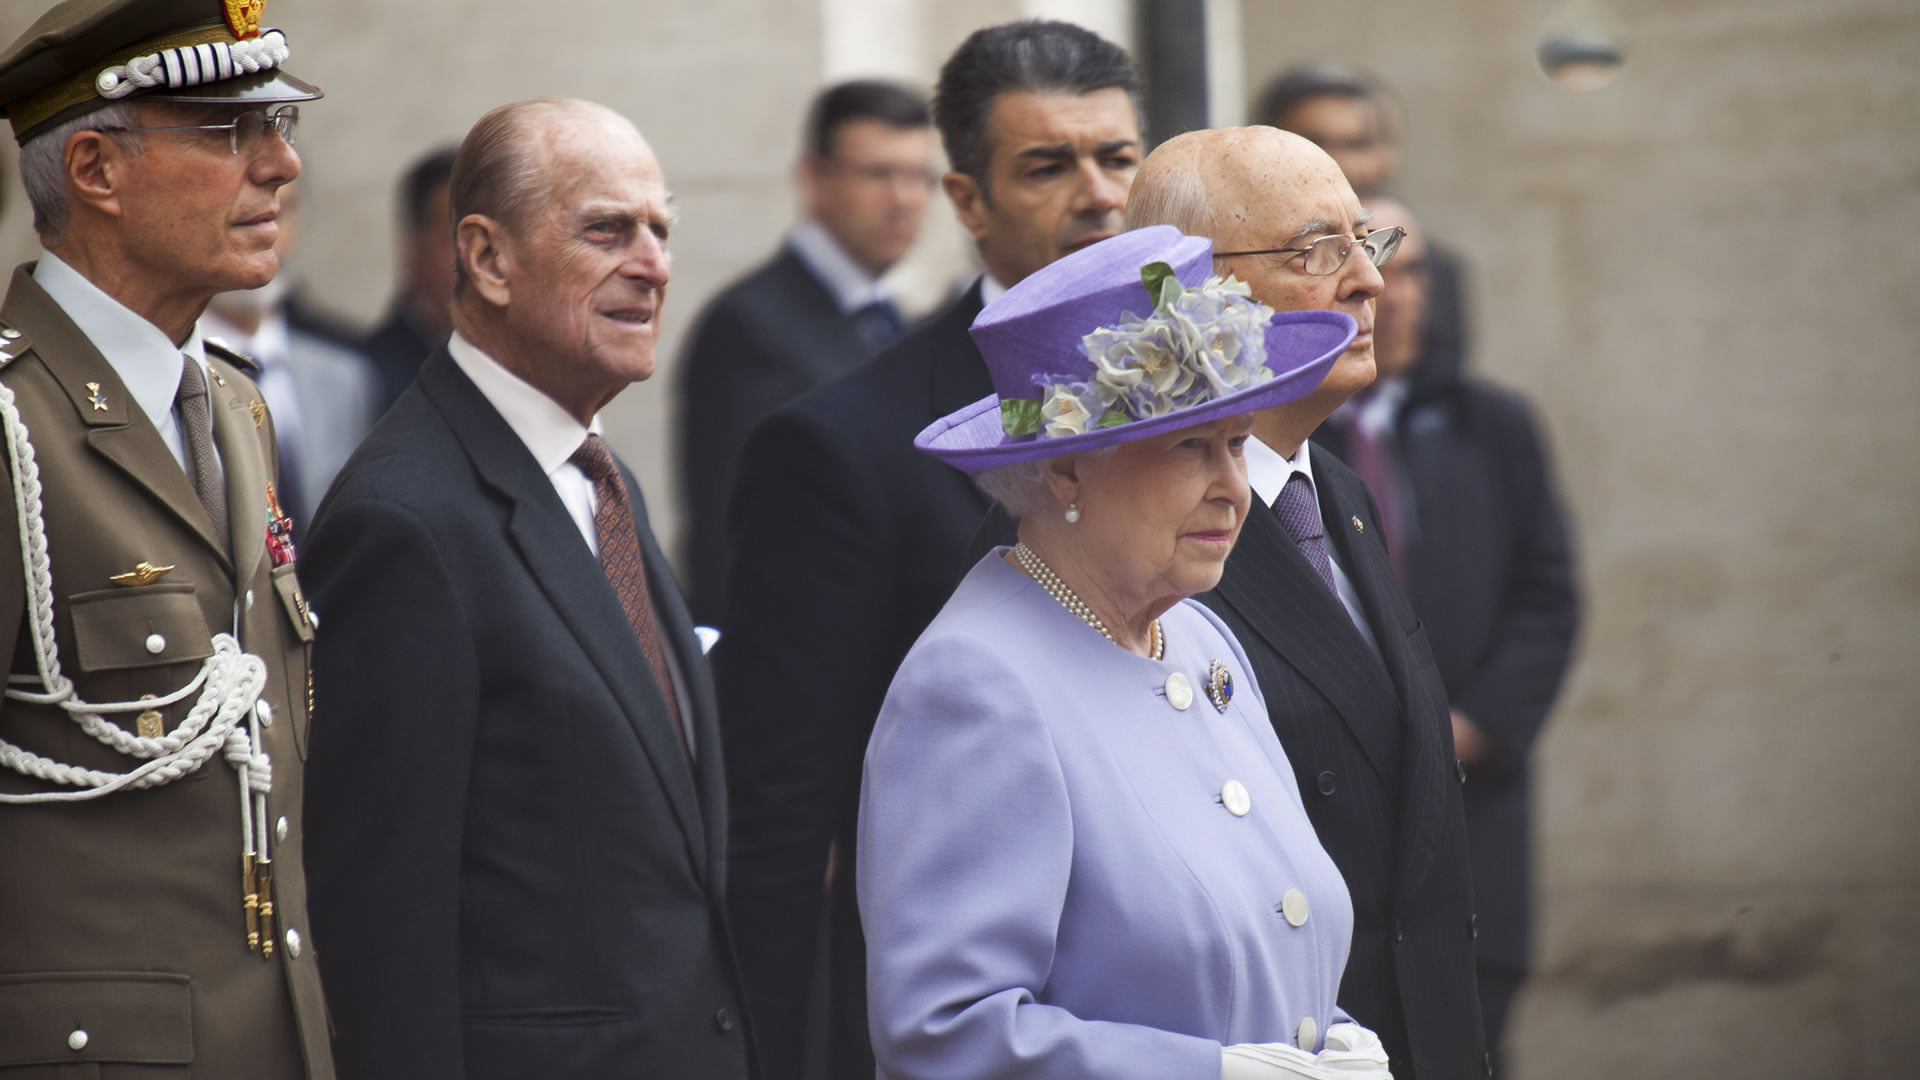 La reina de Inglaterra junto a su consorte Felipe de Edimburgo